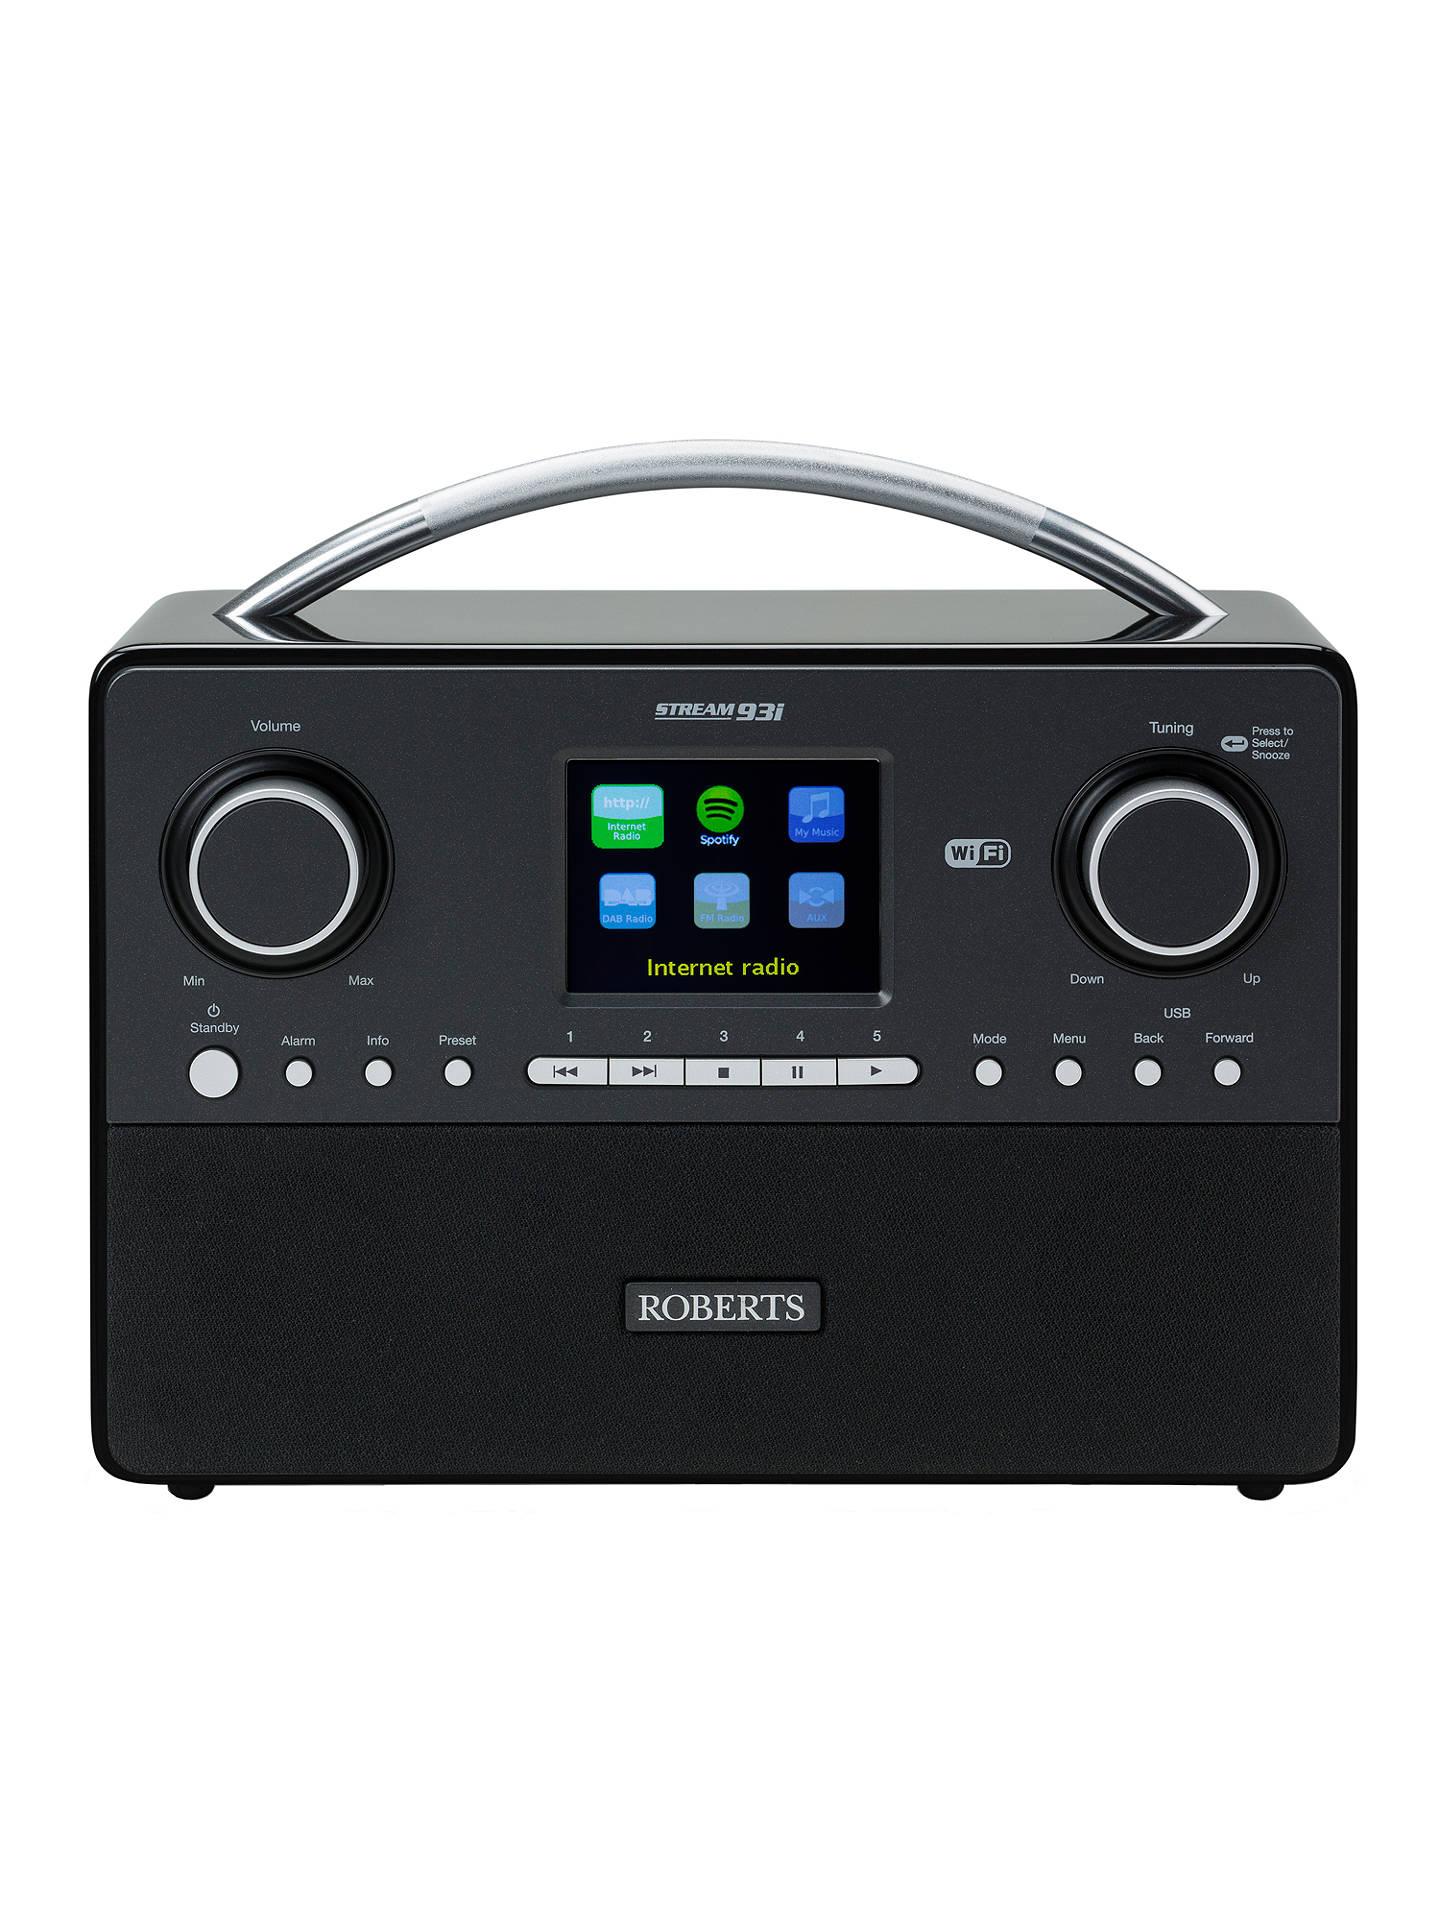 roberts stream 93i dab fm smart radio at john lewis. Black Bedroom Furniture Sets. Home Design Ideas